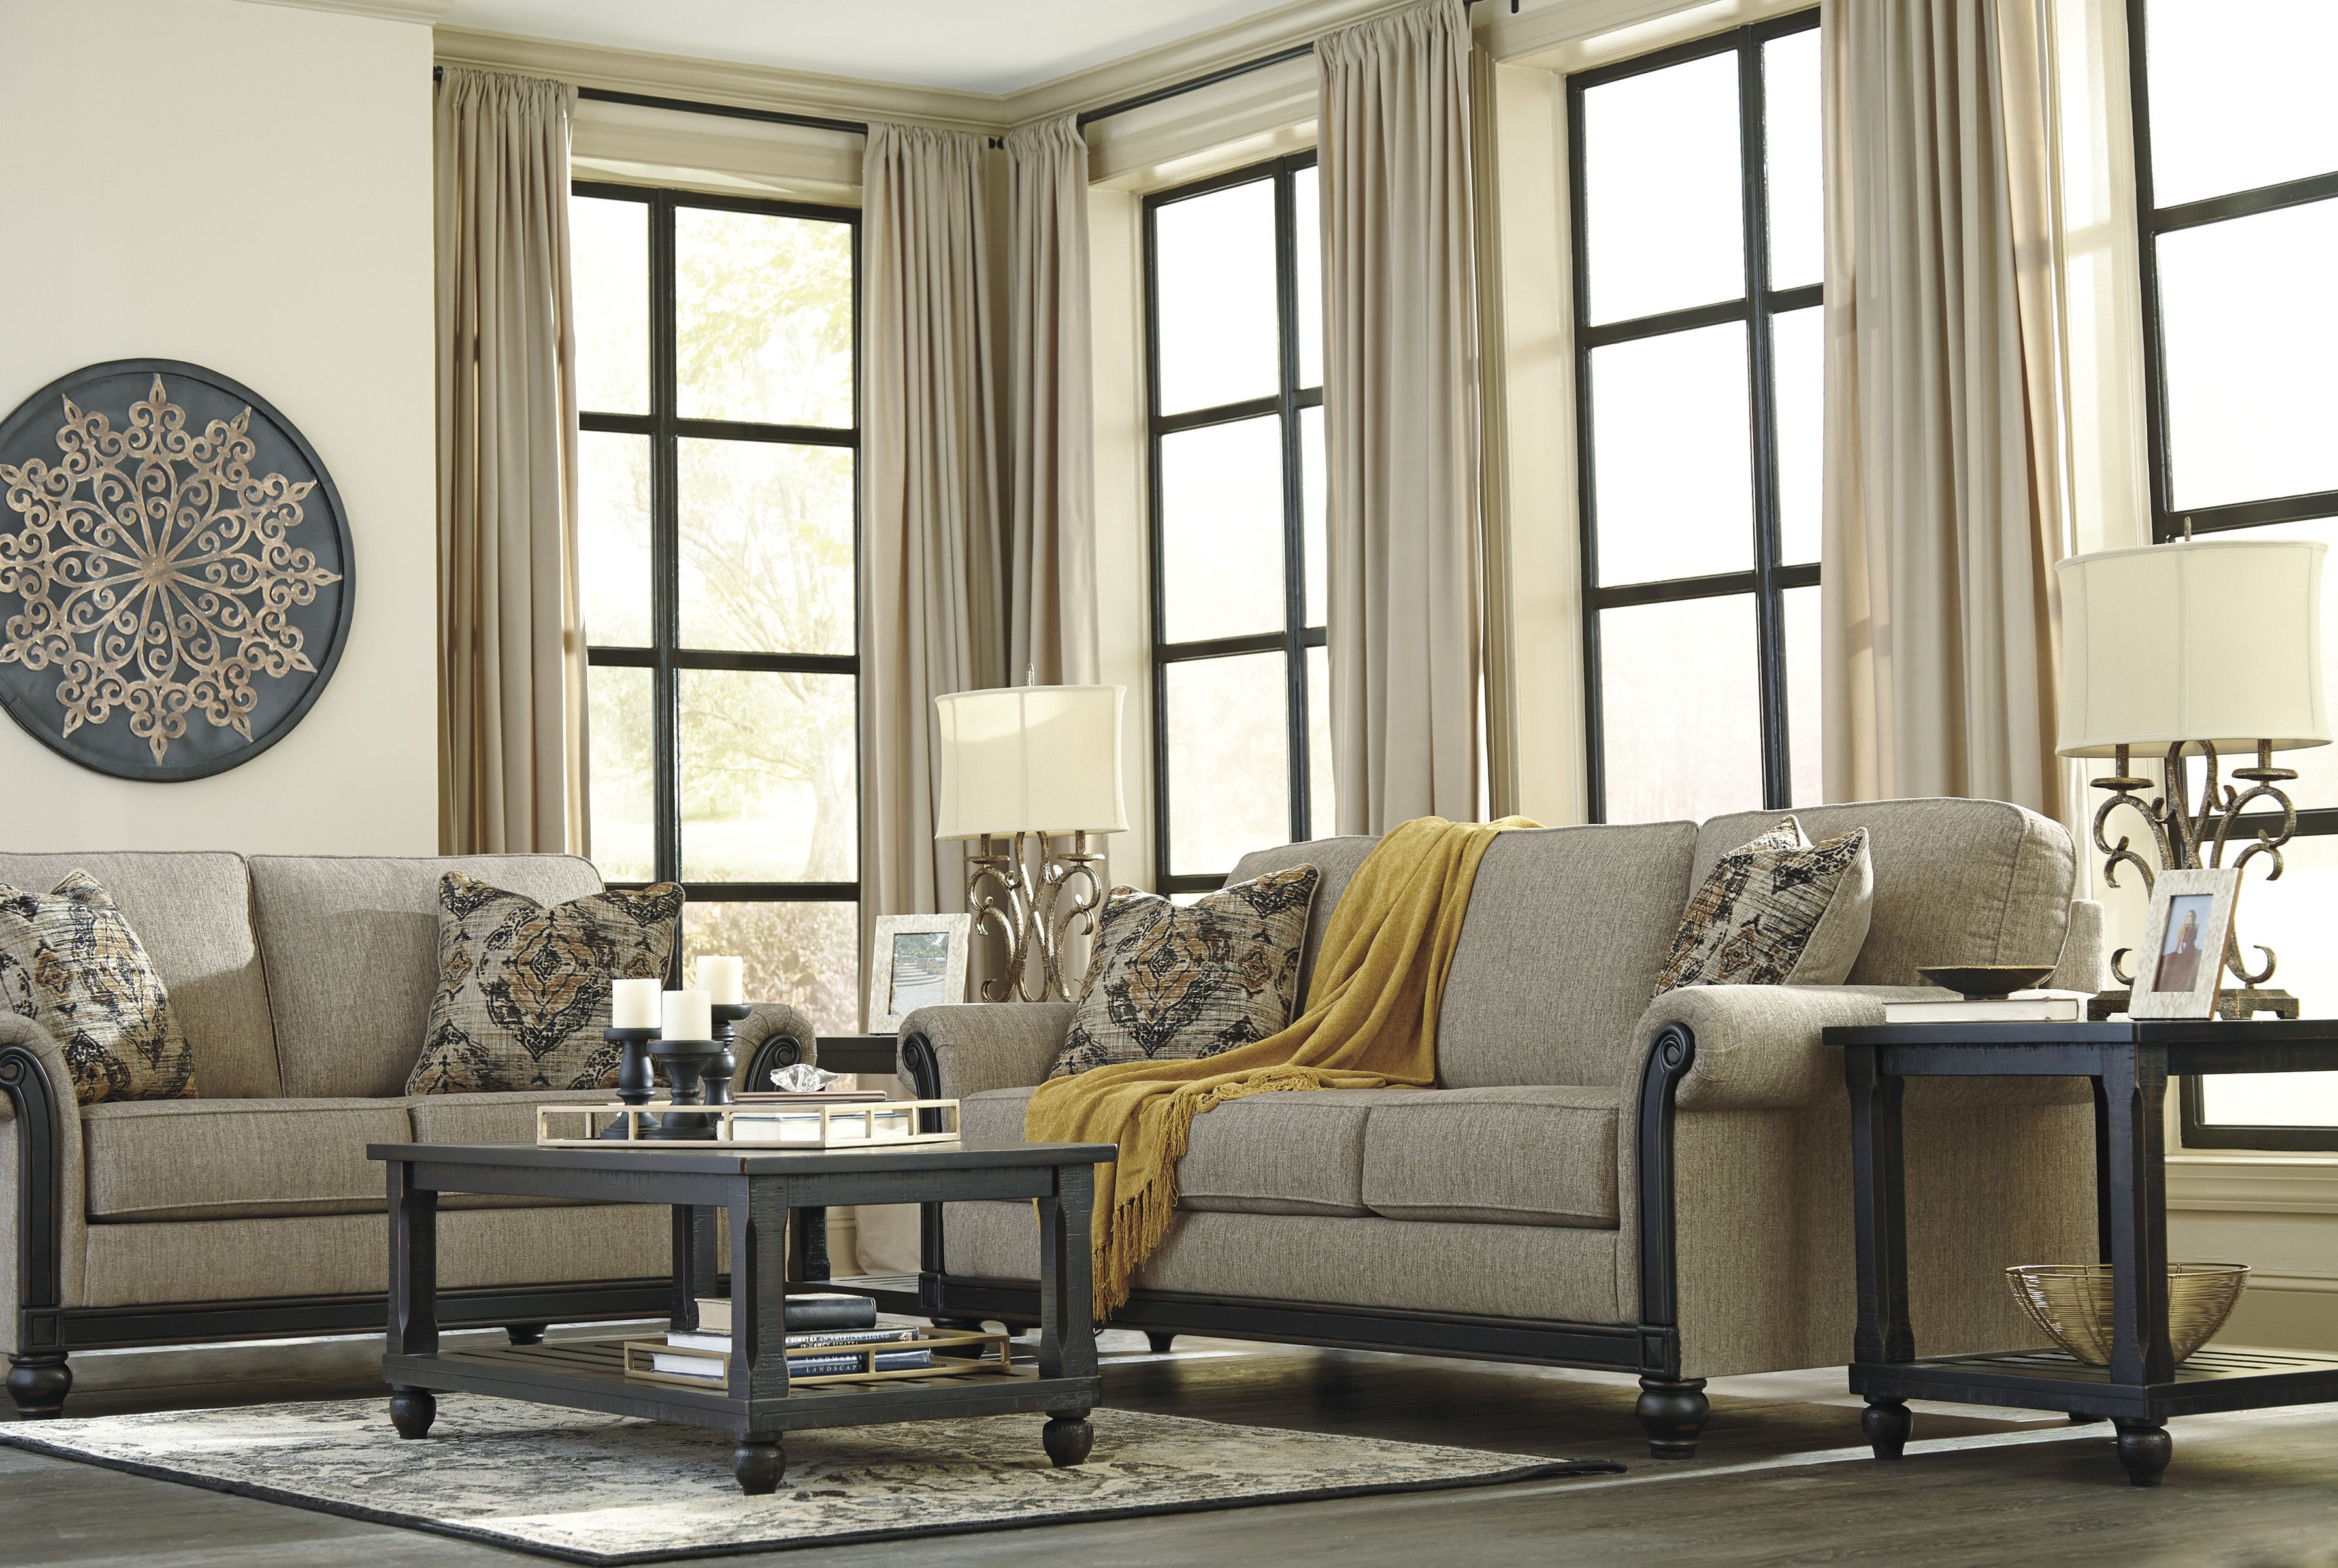 Ashley Blackwood Sofa Homemakers Furniture Homemakers